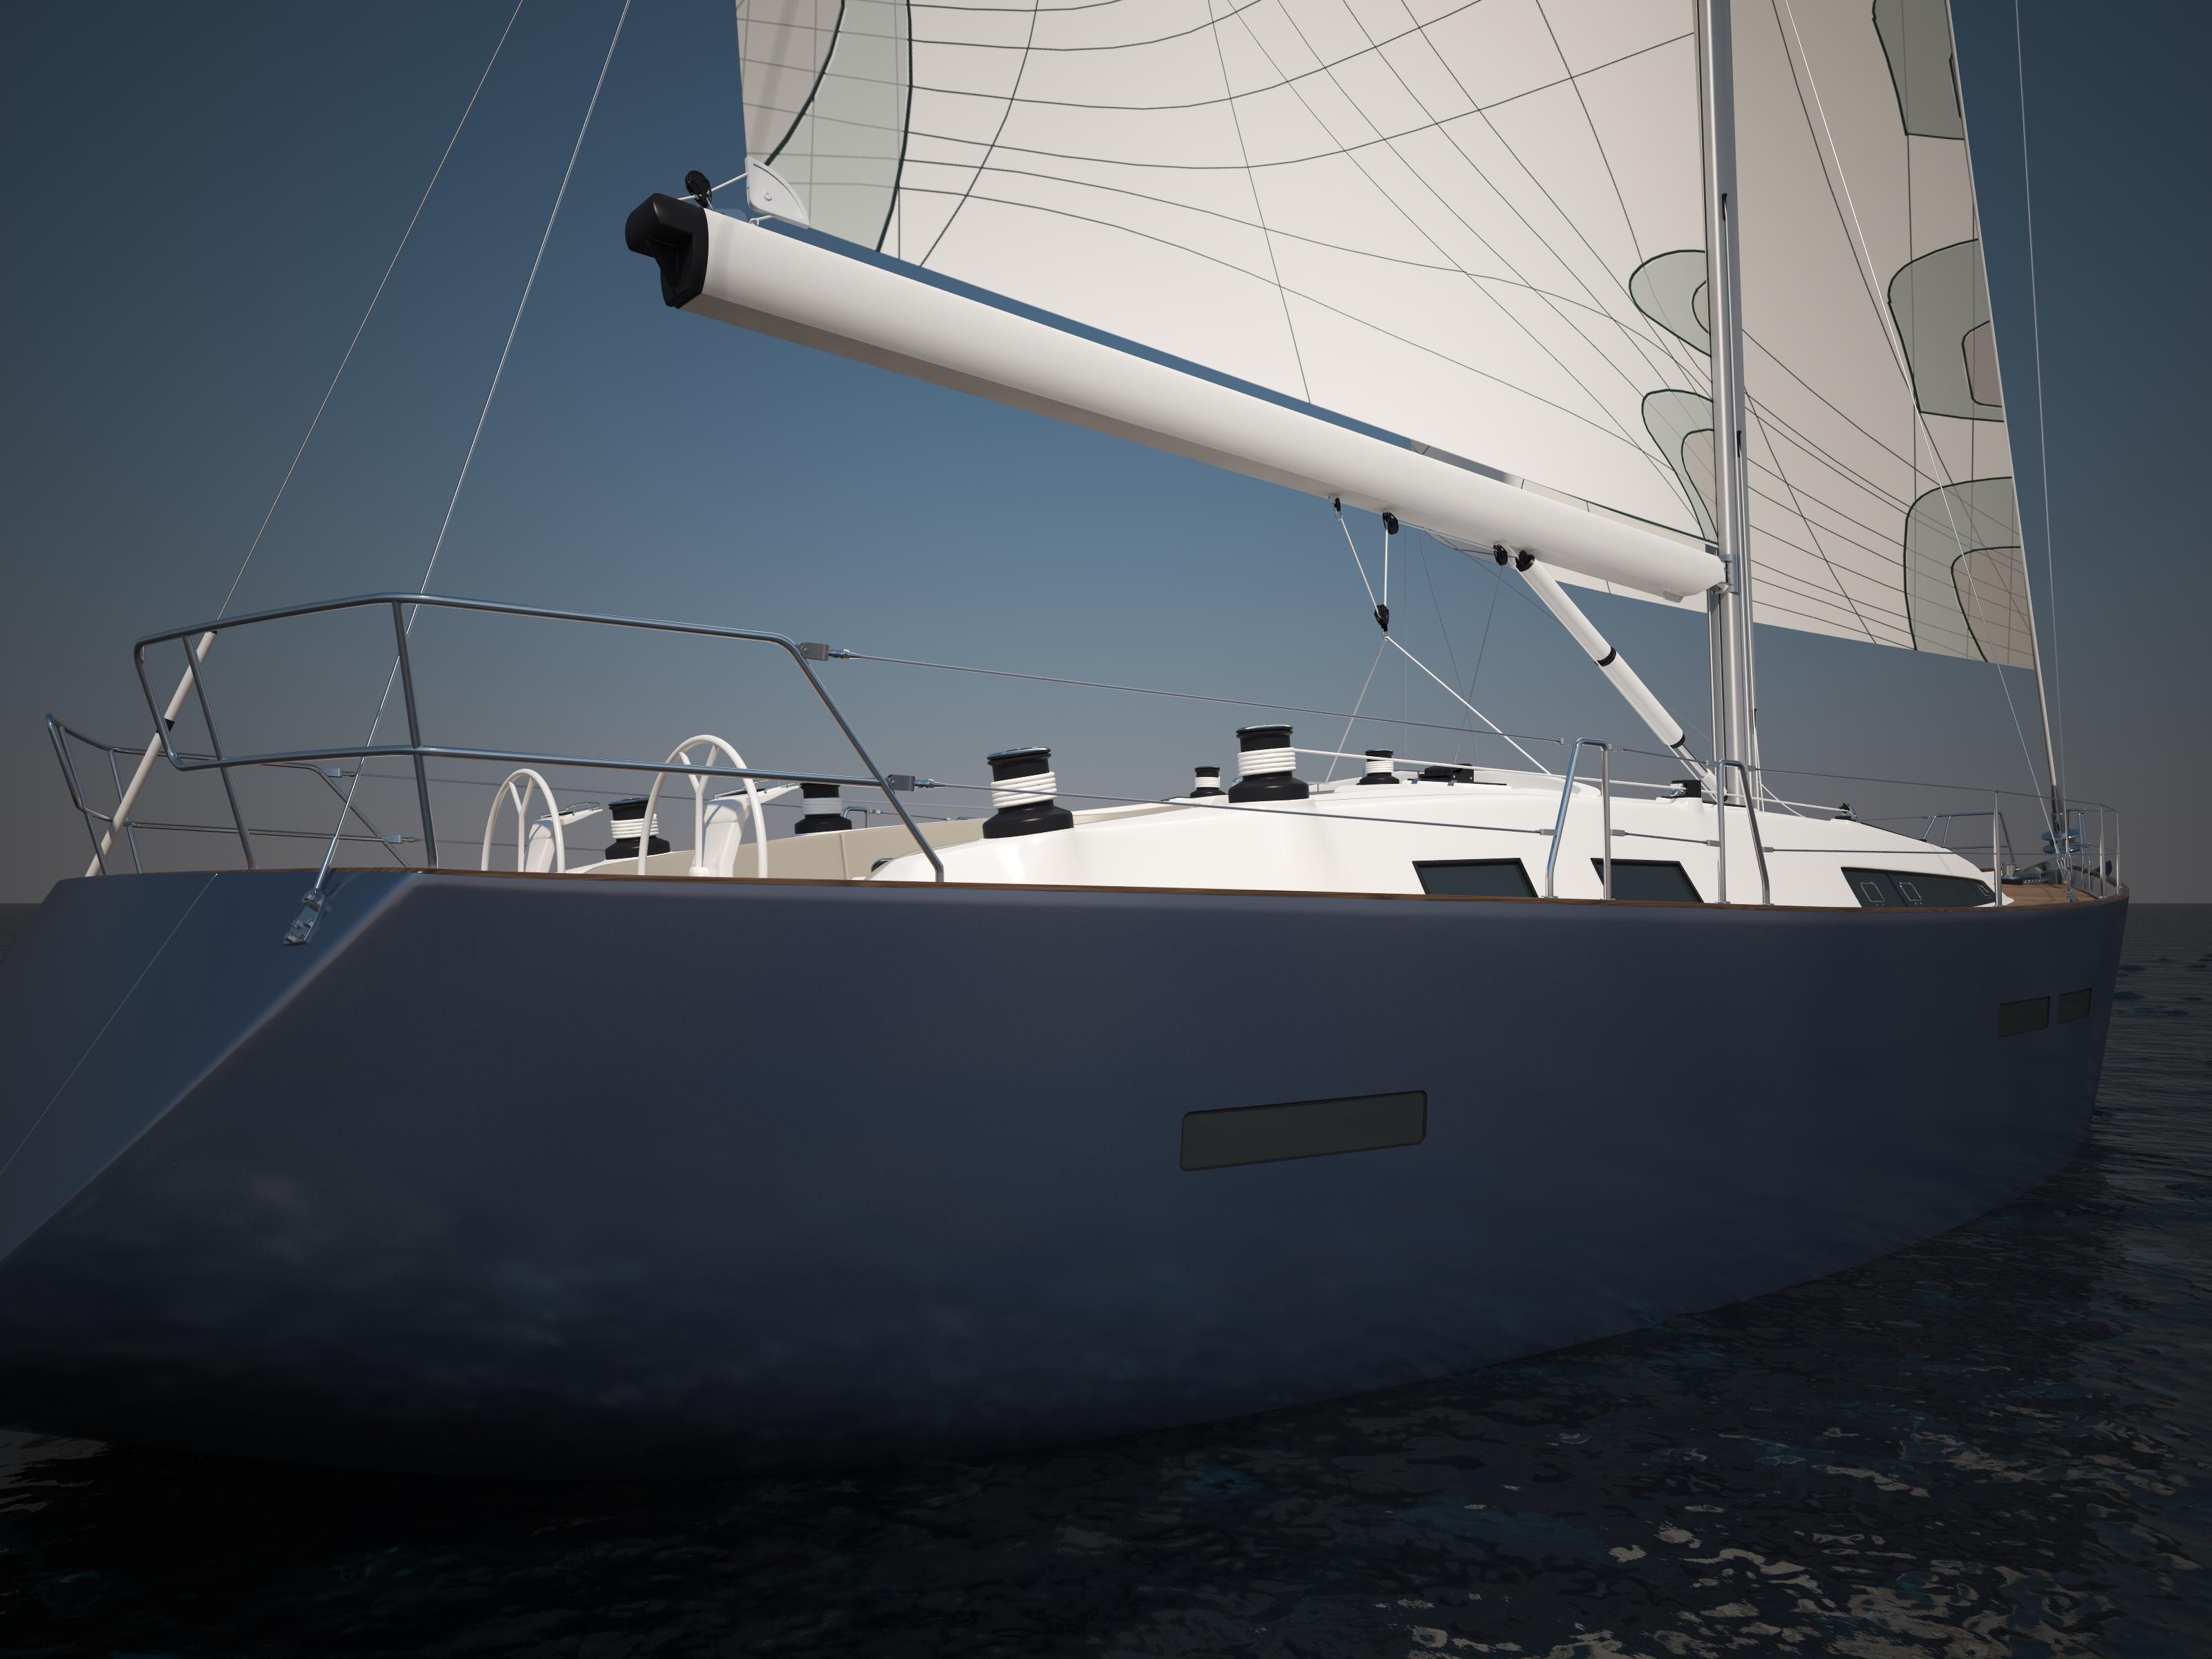 PungRyu50_yachts